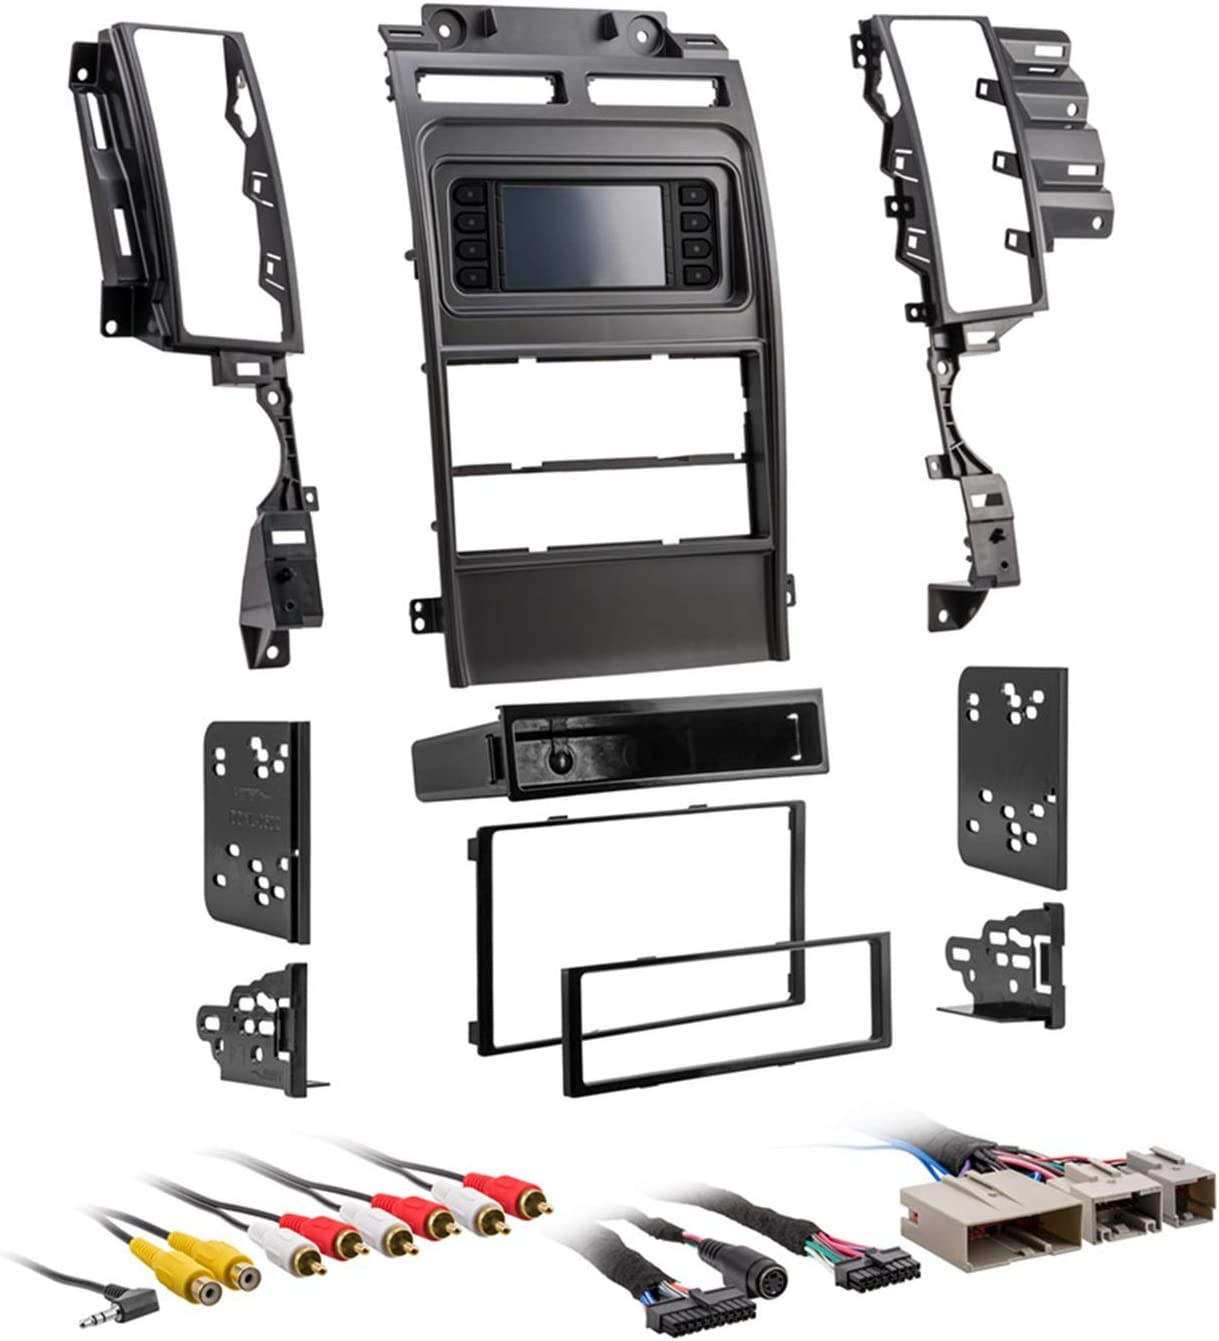 99 ford taurus stereo wiring amazon com metra 99 5722 aftermarket radio installation dash kit  metra 99 5722 aftermarket radio